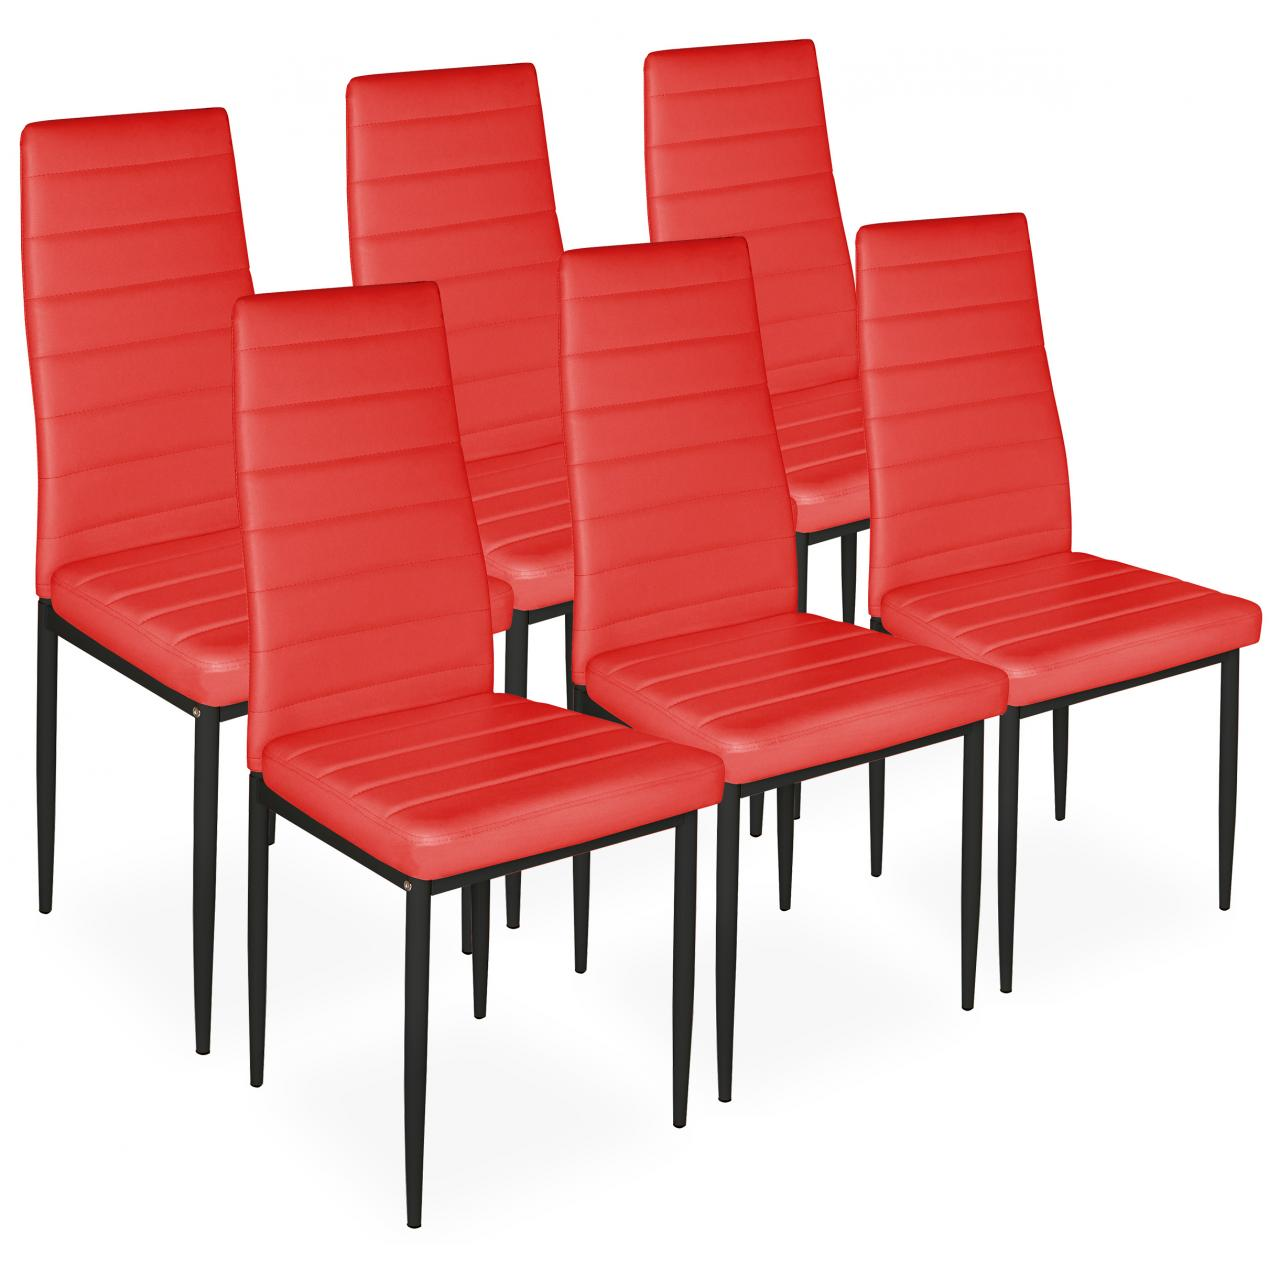 Esszimmer-Stühle Küche Polster-Stuhl-Gruppe Gepolstert 2er 4er oder ...